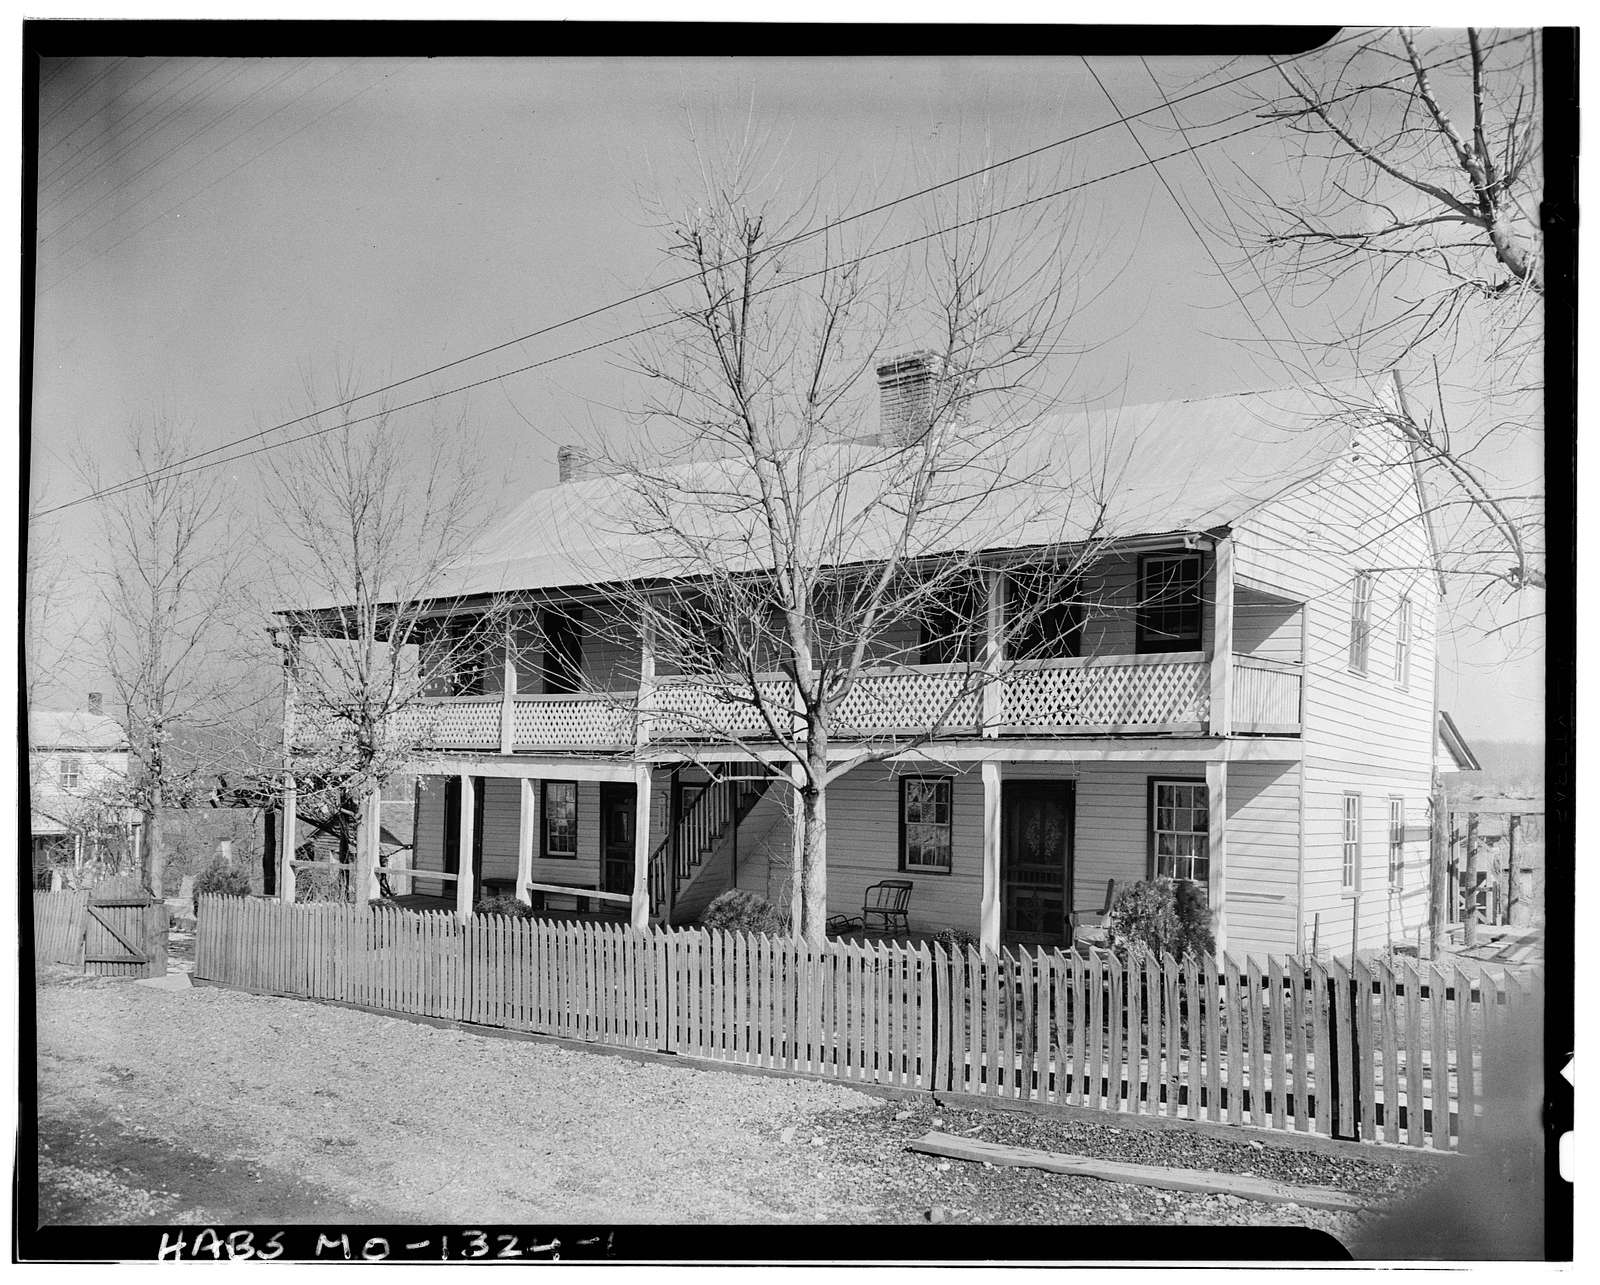 Shoultz-Mclane House, Appleton, Cape Girardeau County, MO